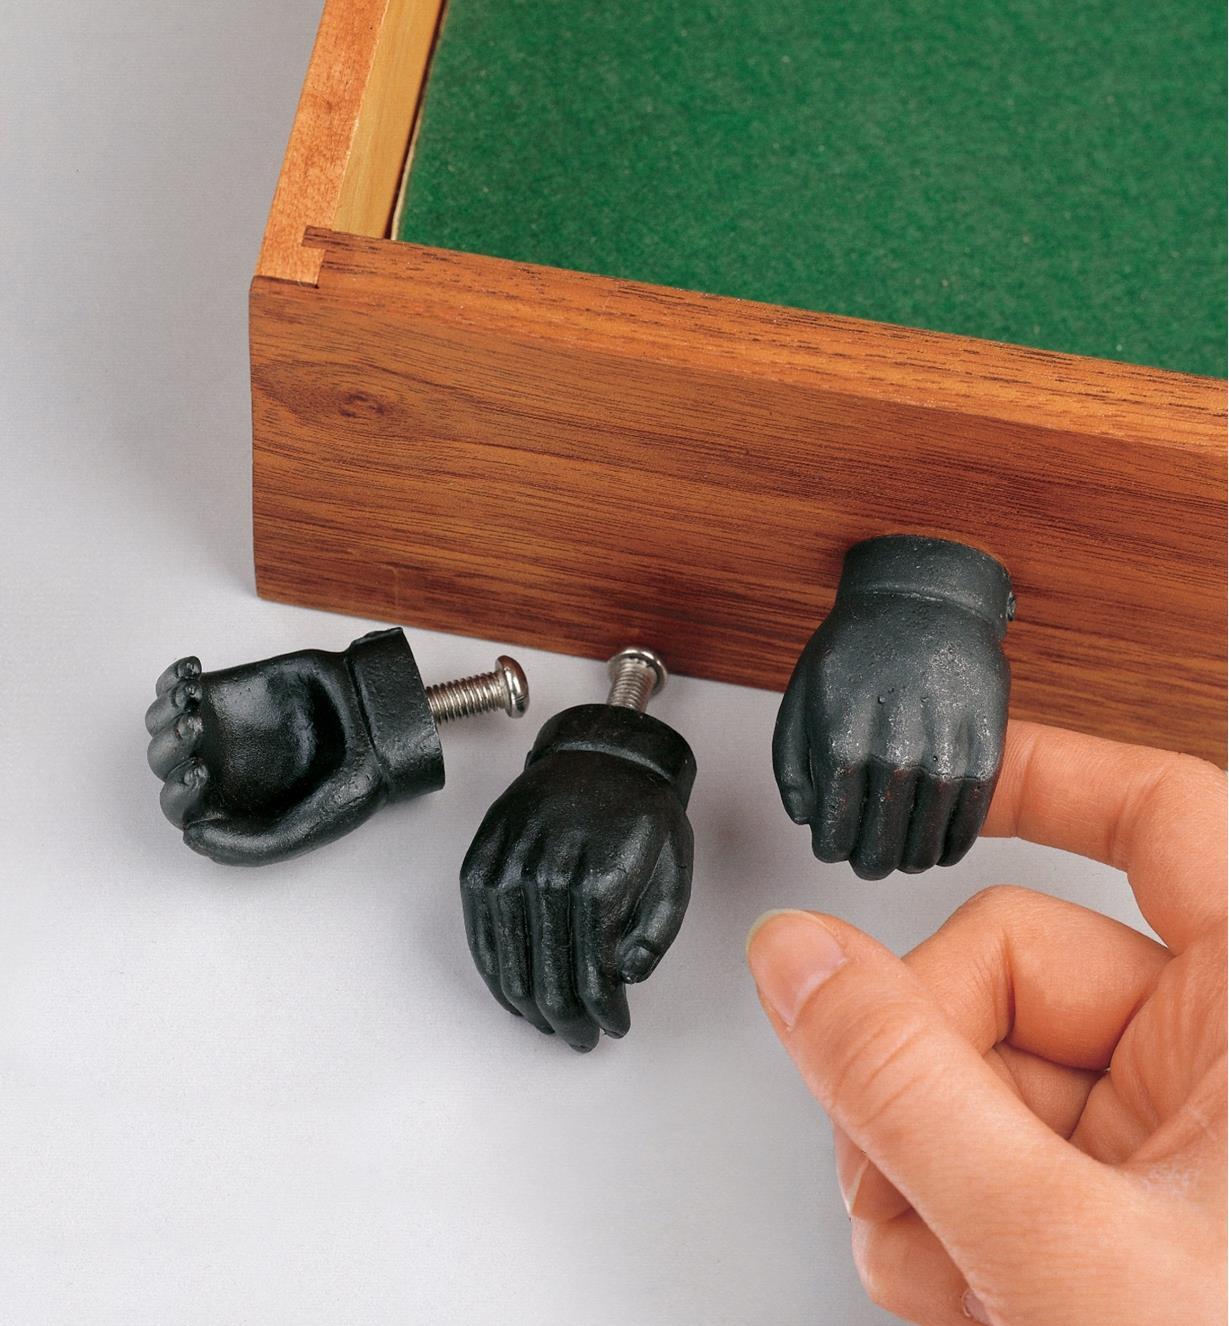 01K3310 - Hands, pair (left & right)